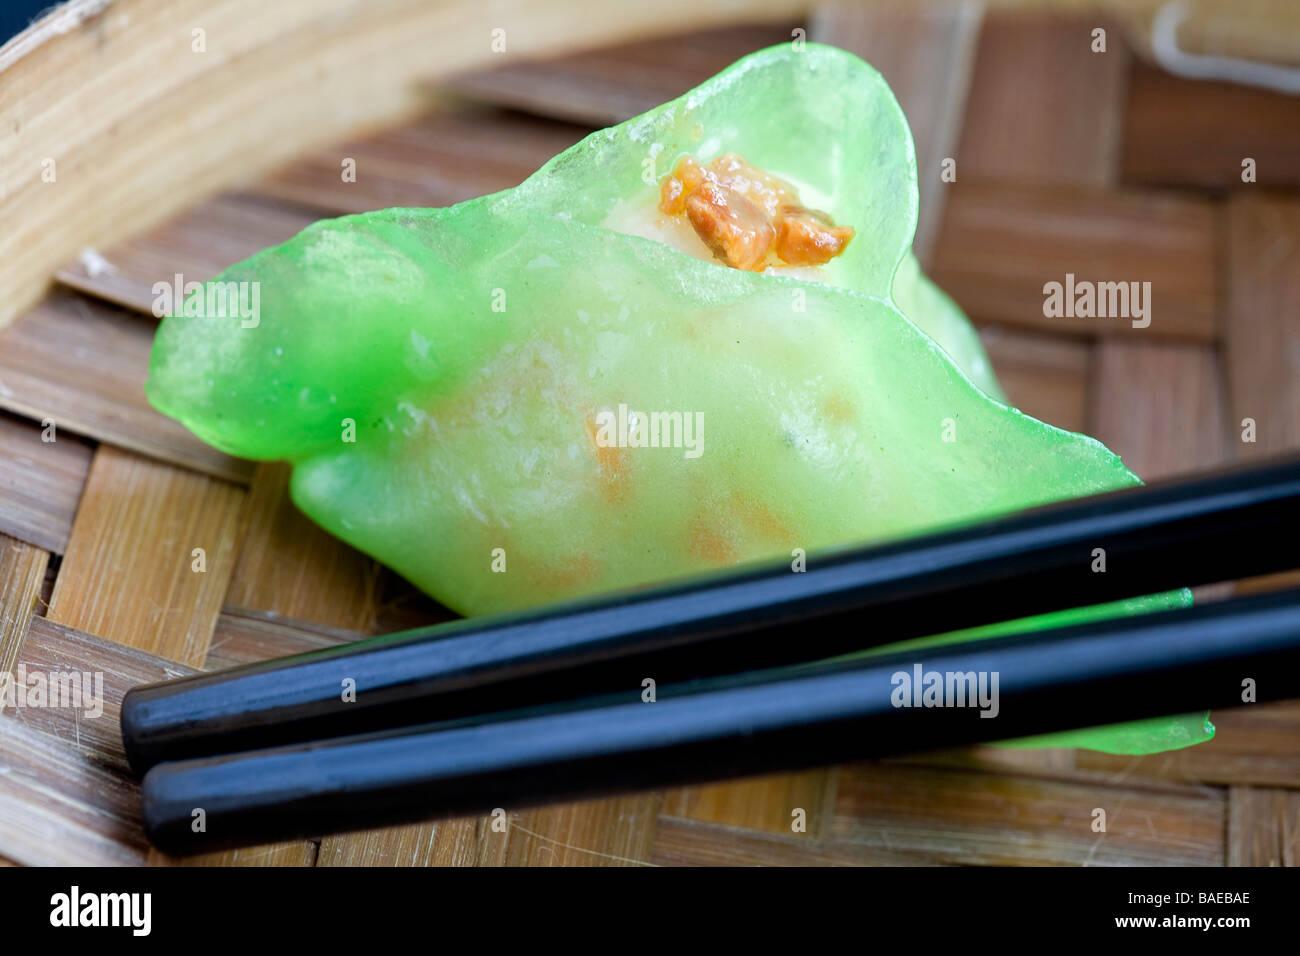 Singapur, la Esplanada, mi humilde casa restaurante, dim sum Imagen De Stock